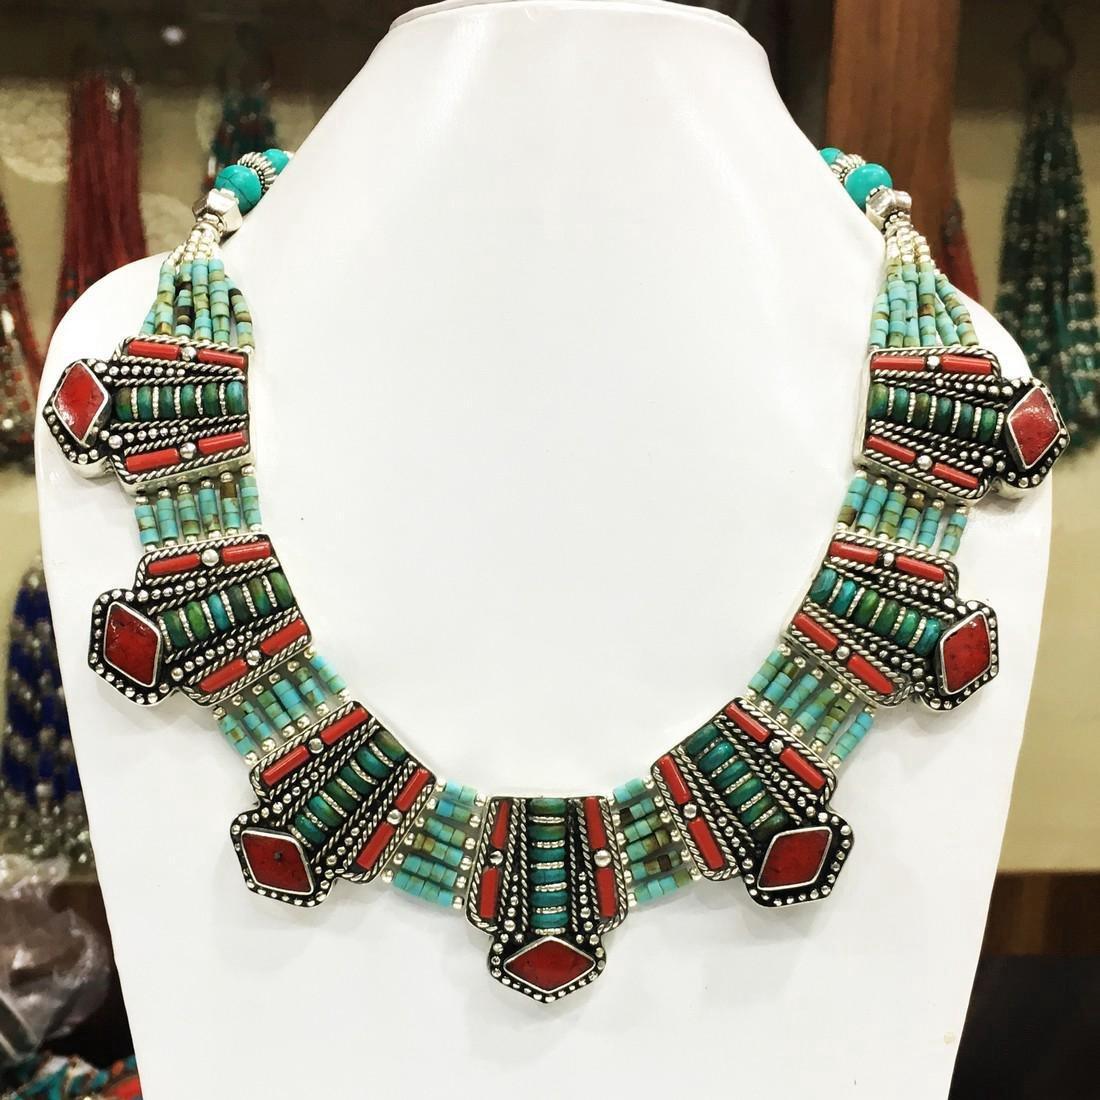 Vintage Tibetan Silver Women's Handmade Tribal Necklace